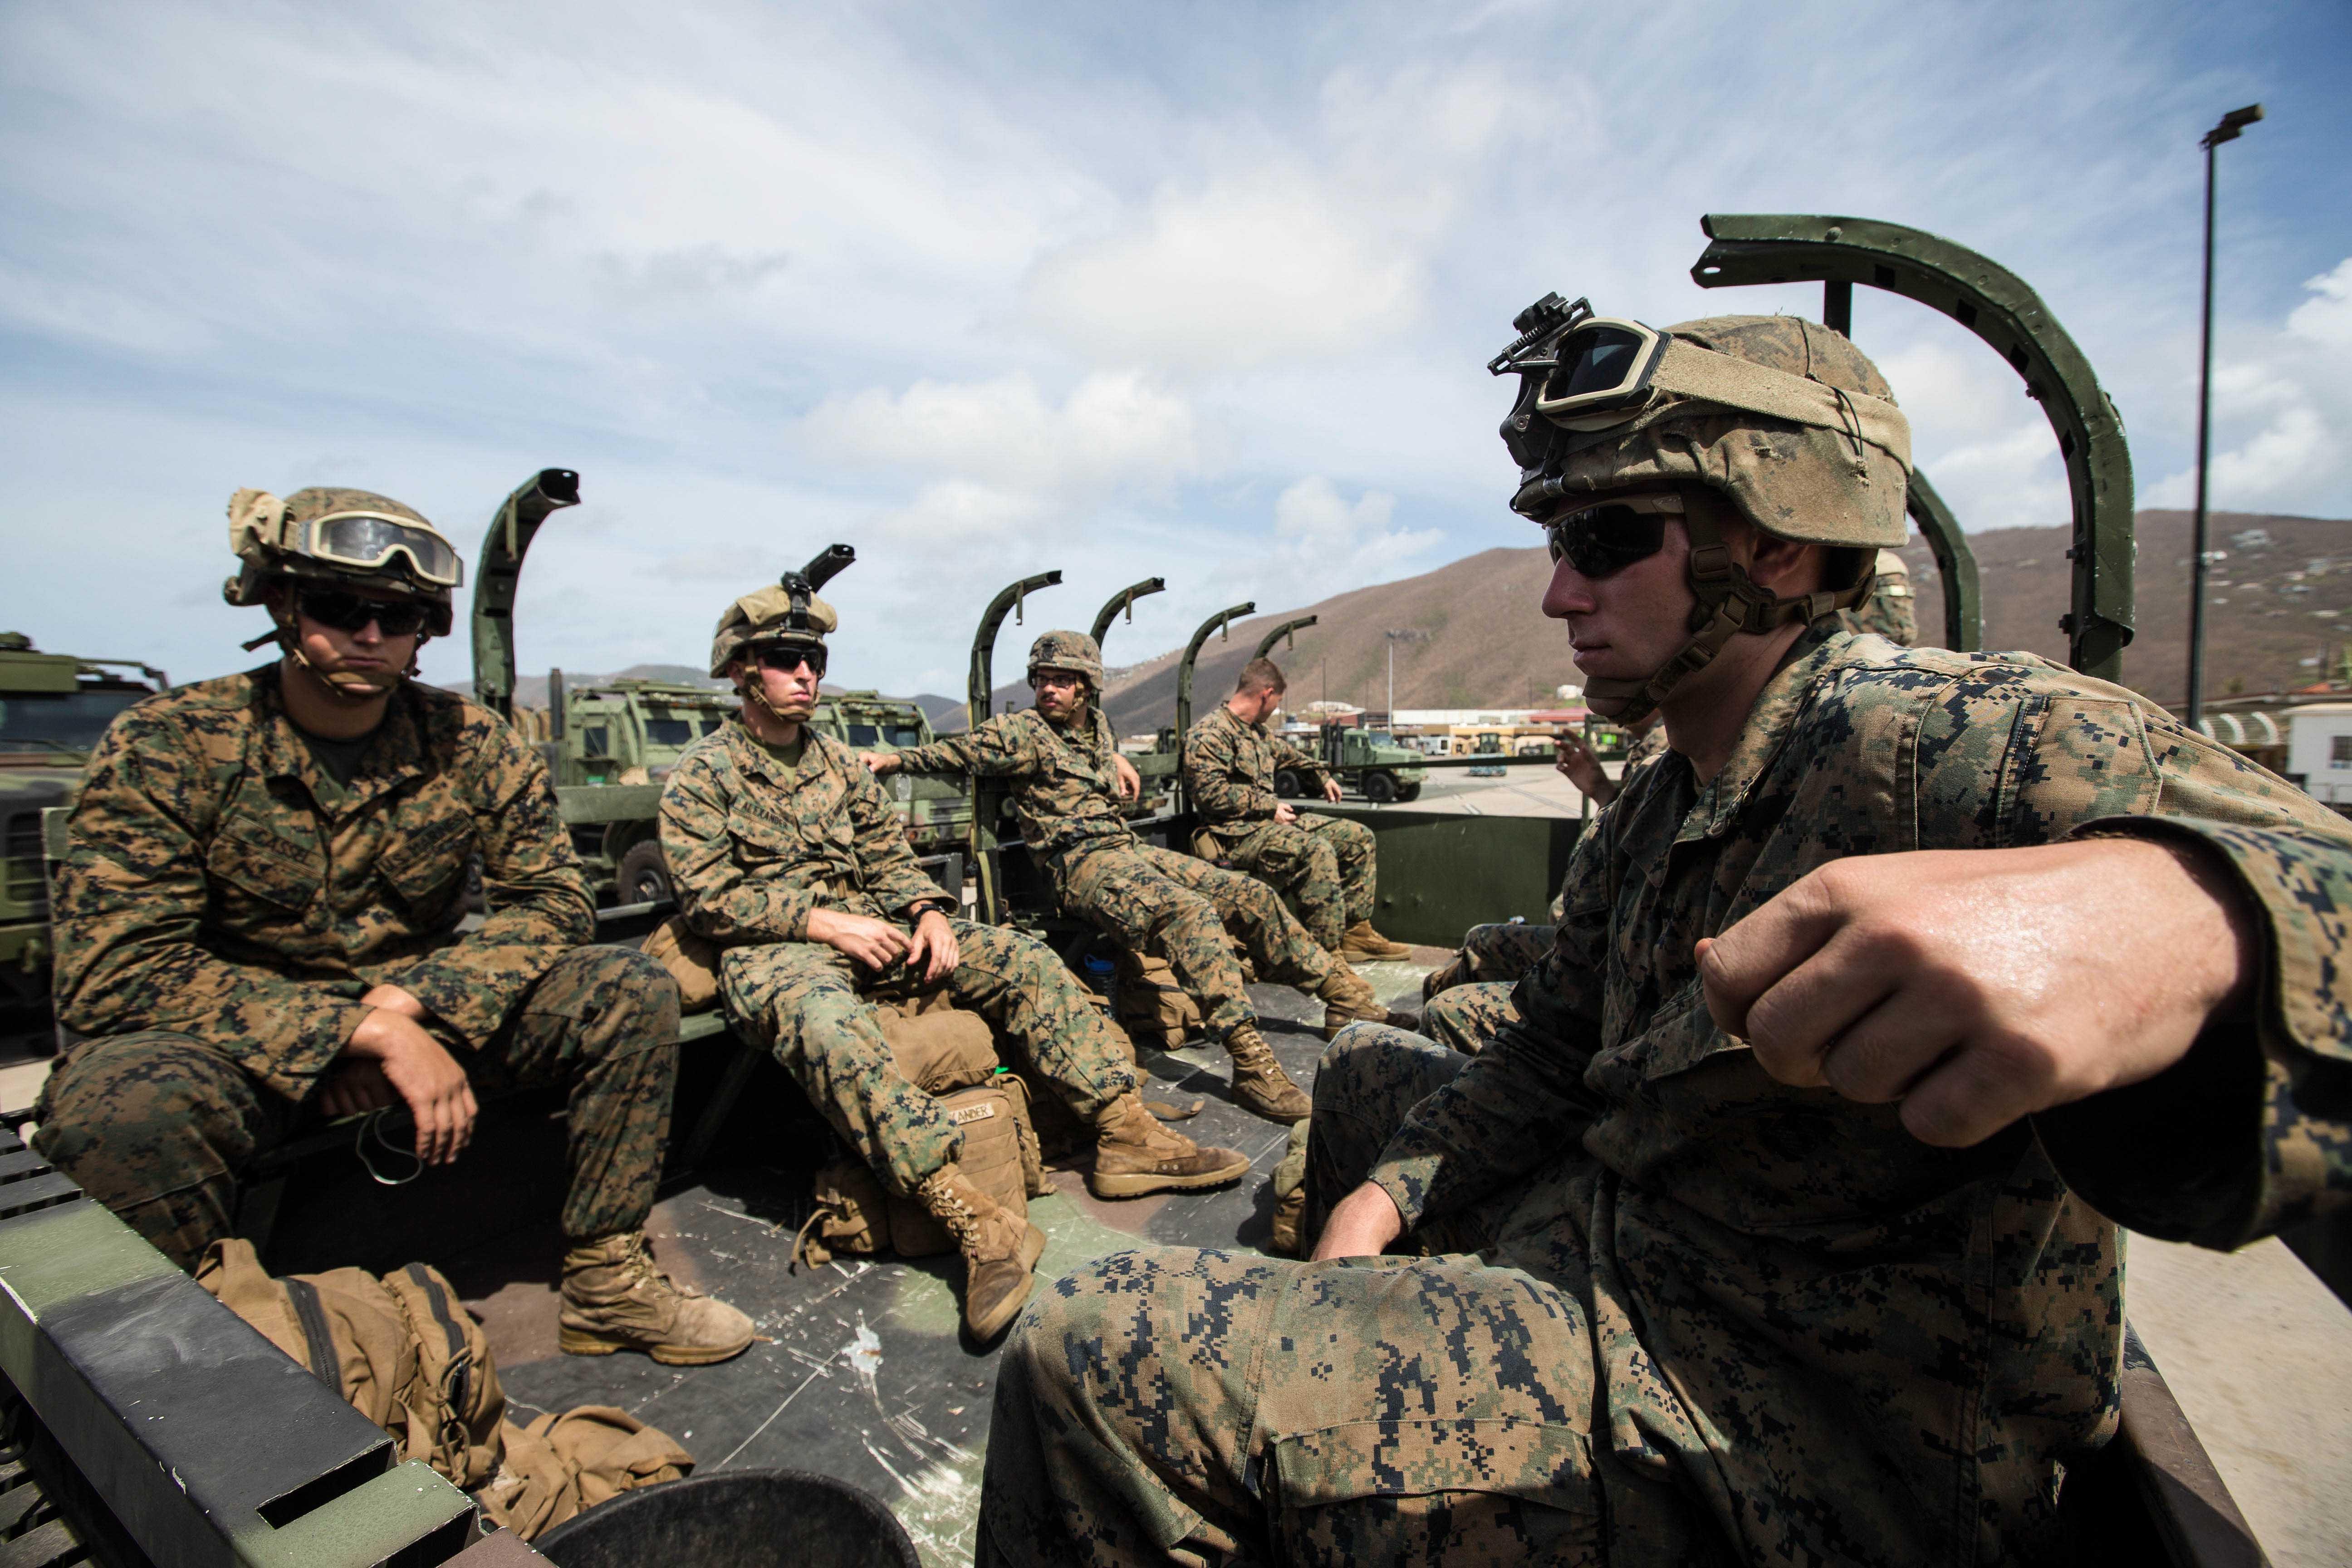 26th Marine Expeditionary Unit